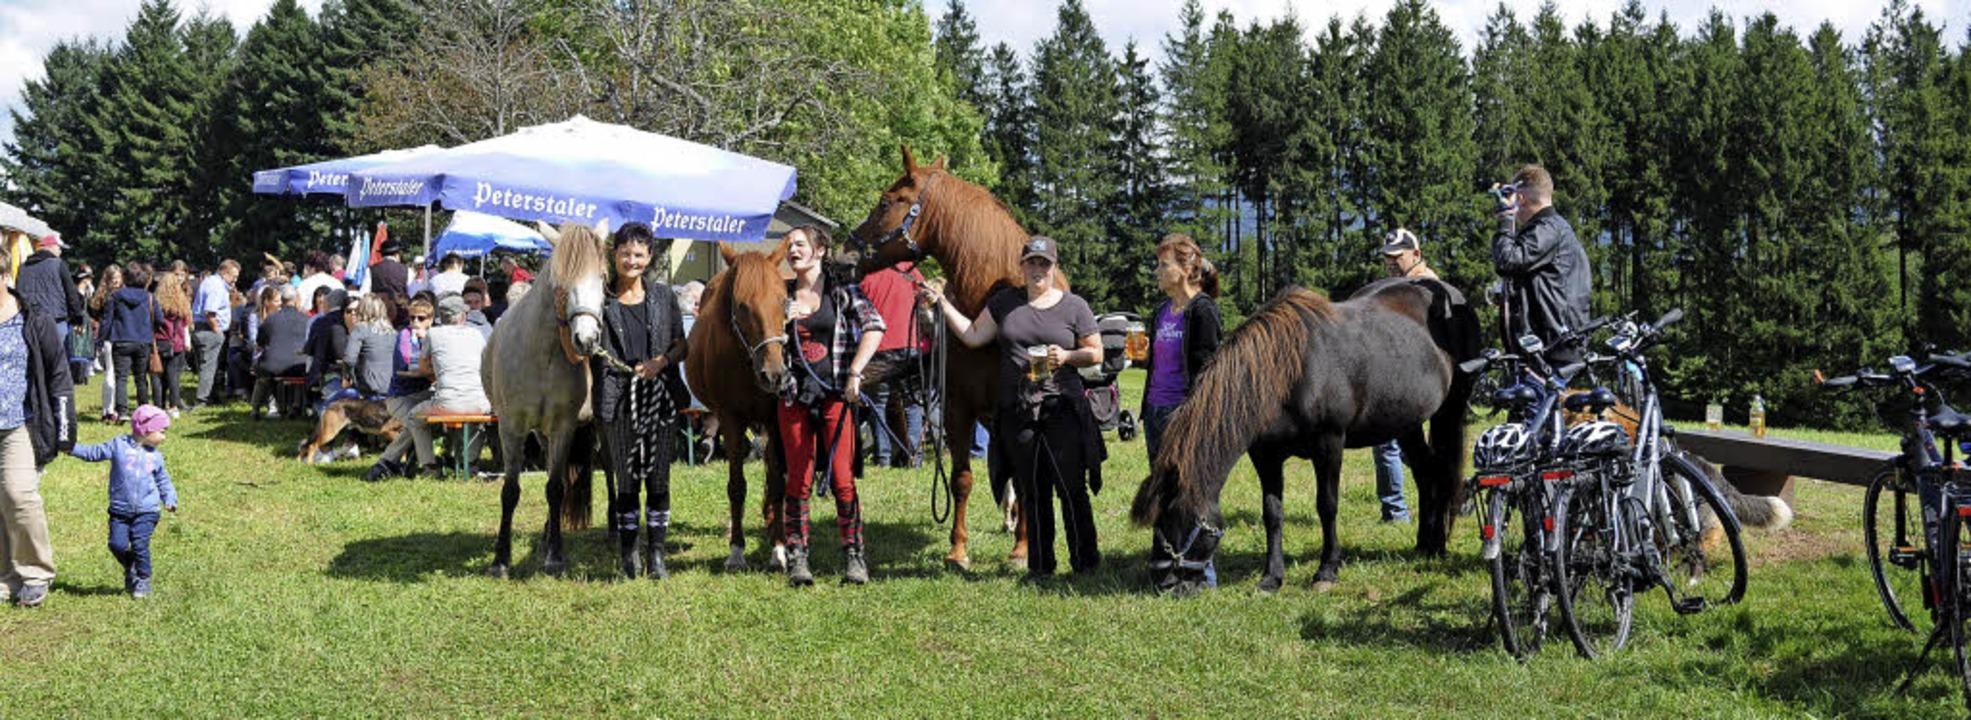 Die Besucher kamen zu  Fuß, per Rad od...m Pferd nach Katzenmoos zum Bergfest.     Foto: Fotos: Andrea  Kurz